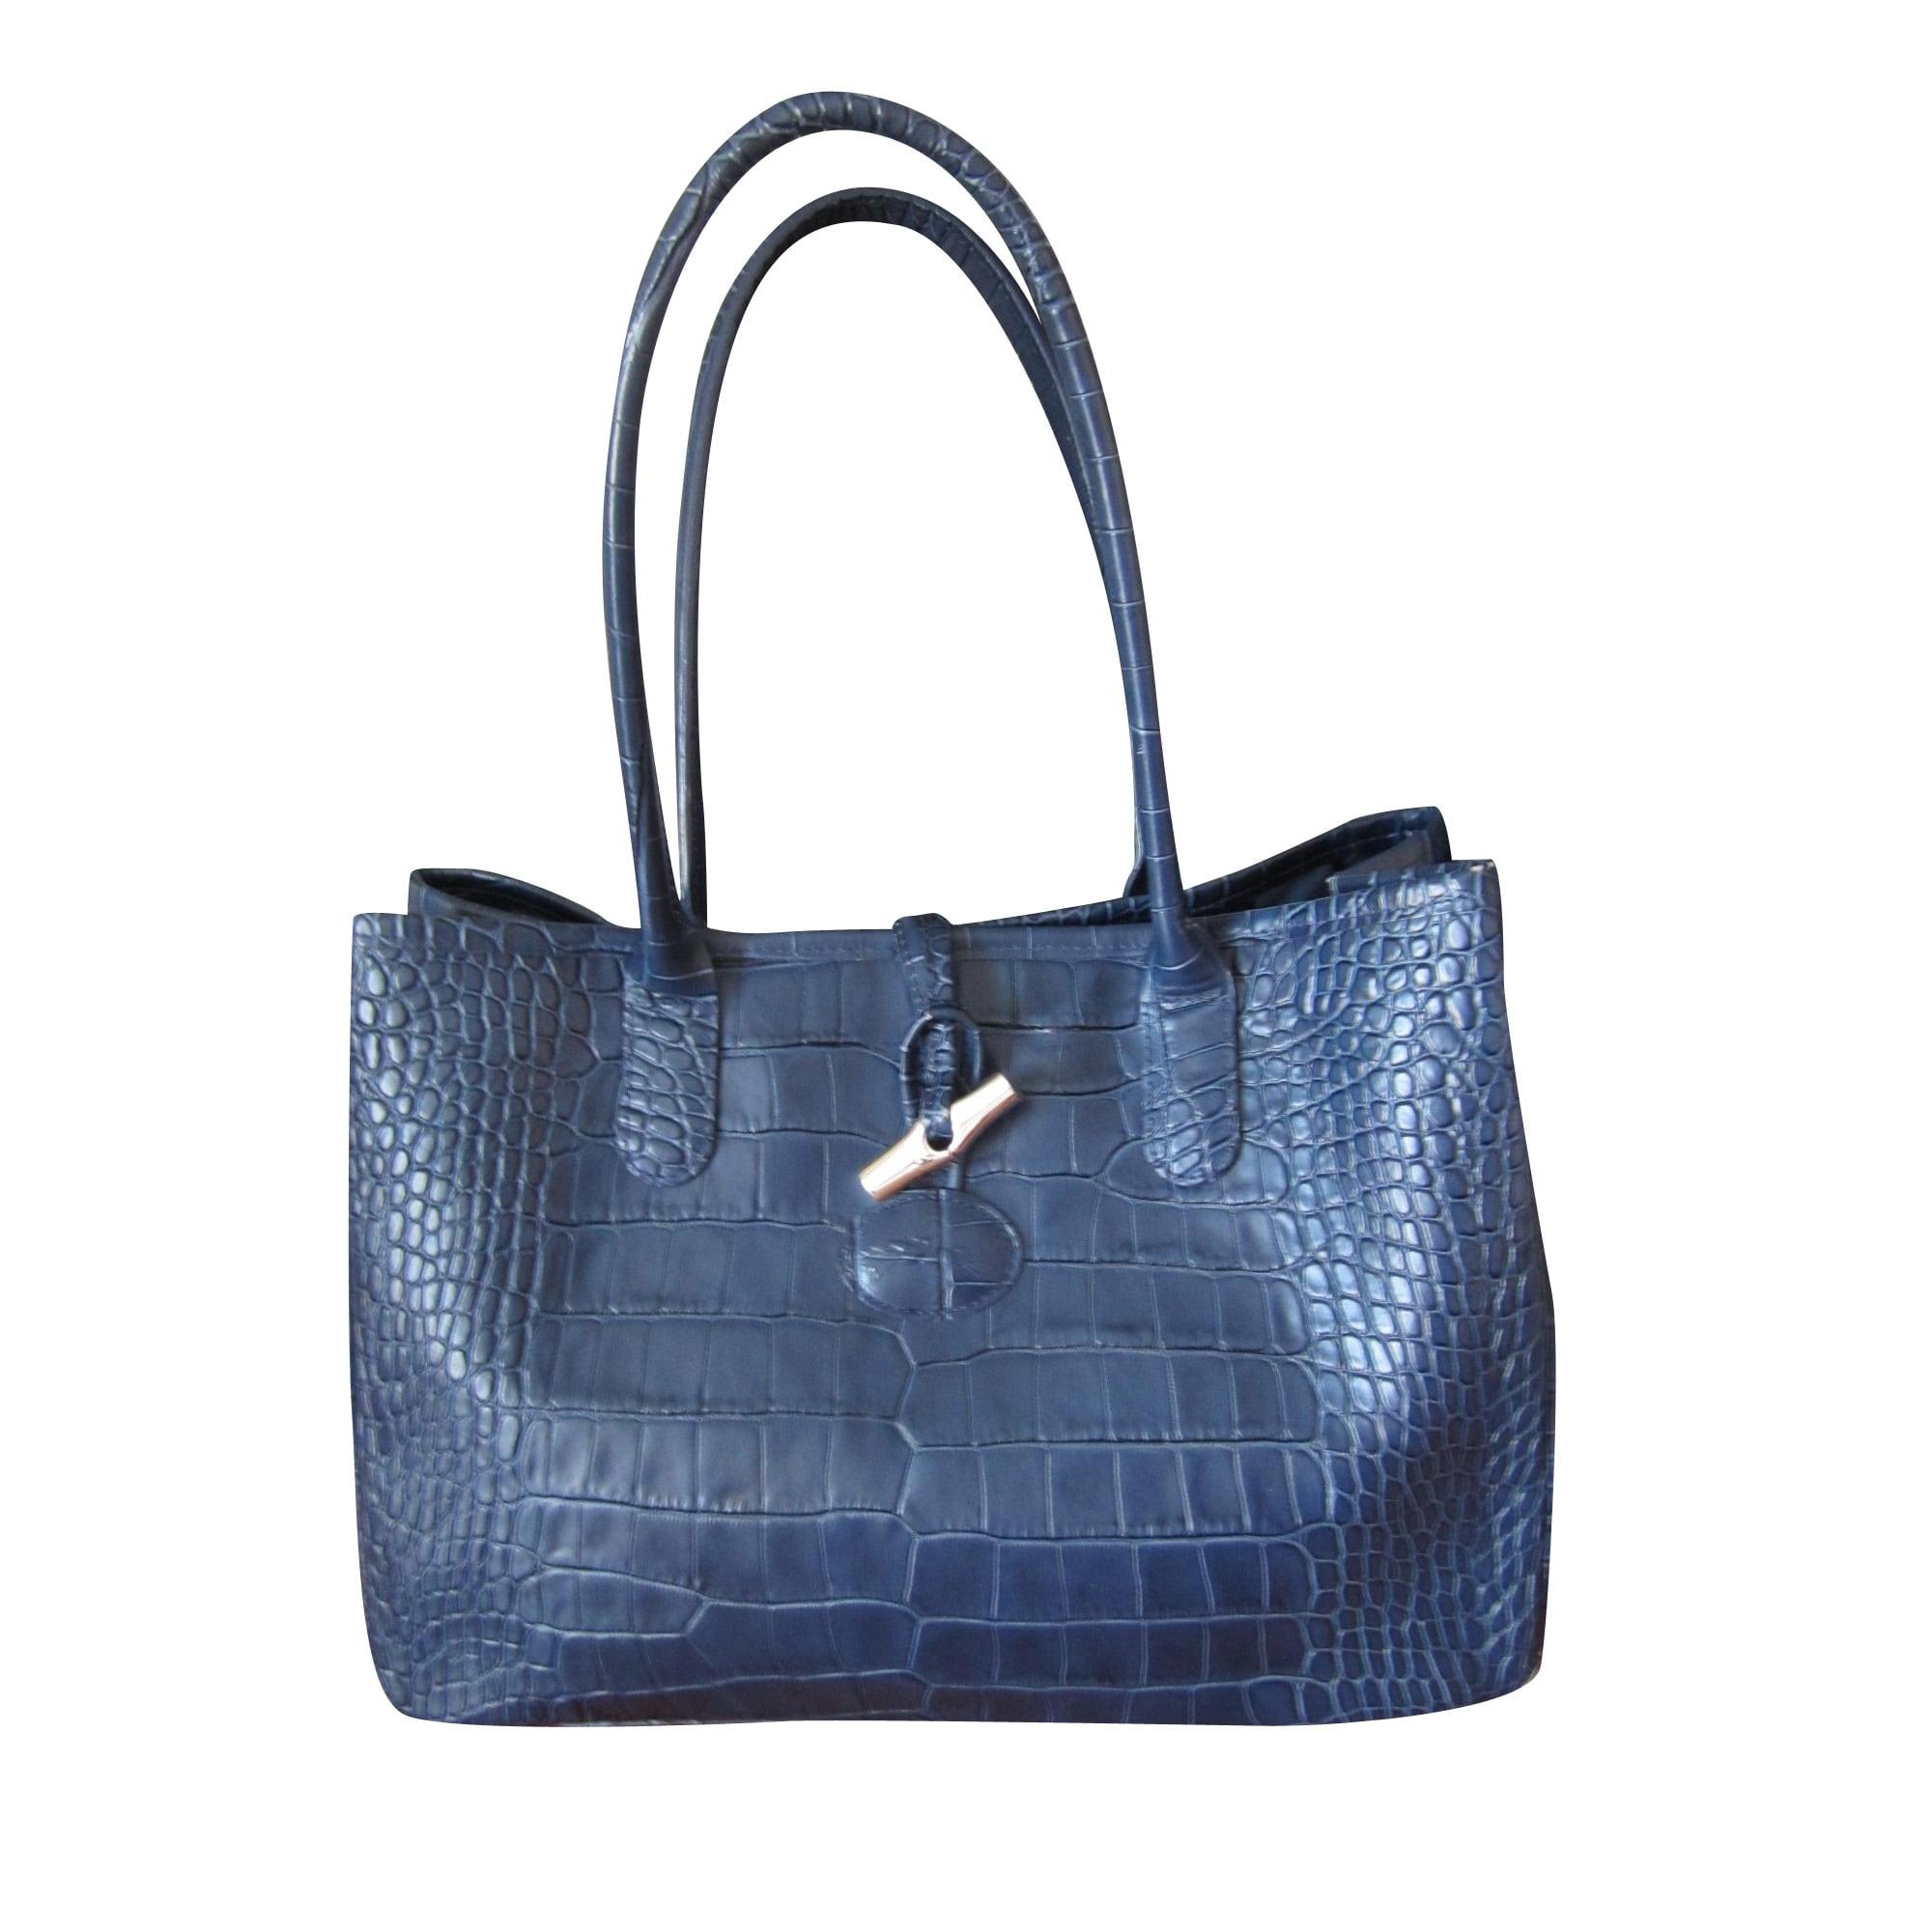 Sac à main en cuir LONGCHAMP bleu vendu par Le dressing de karo ... b861e186c0b